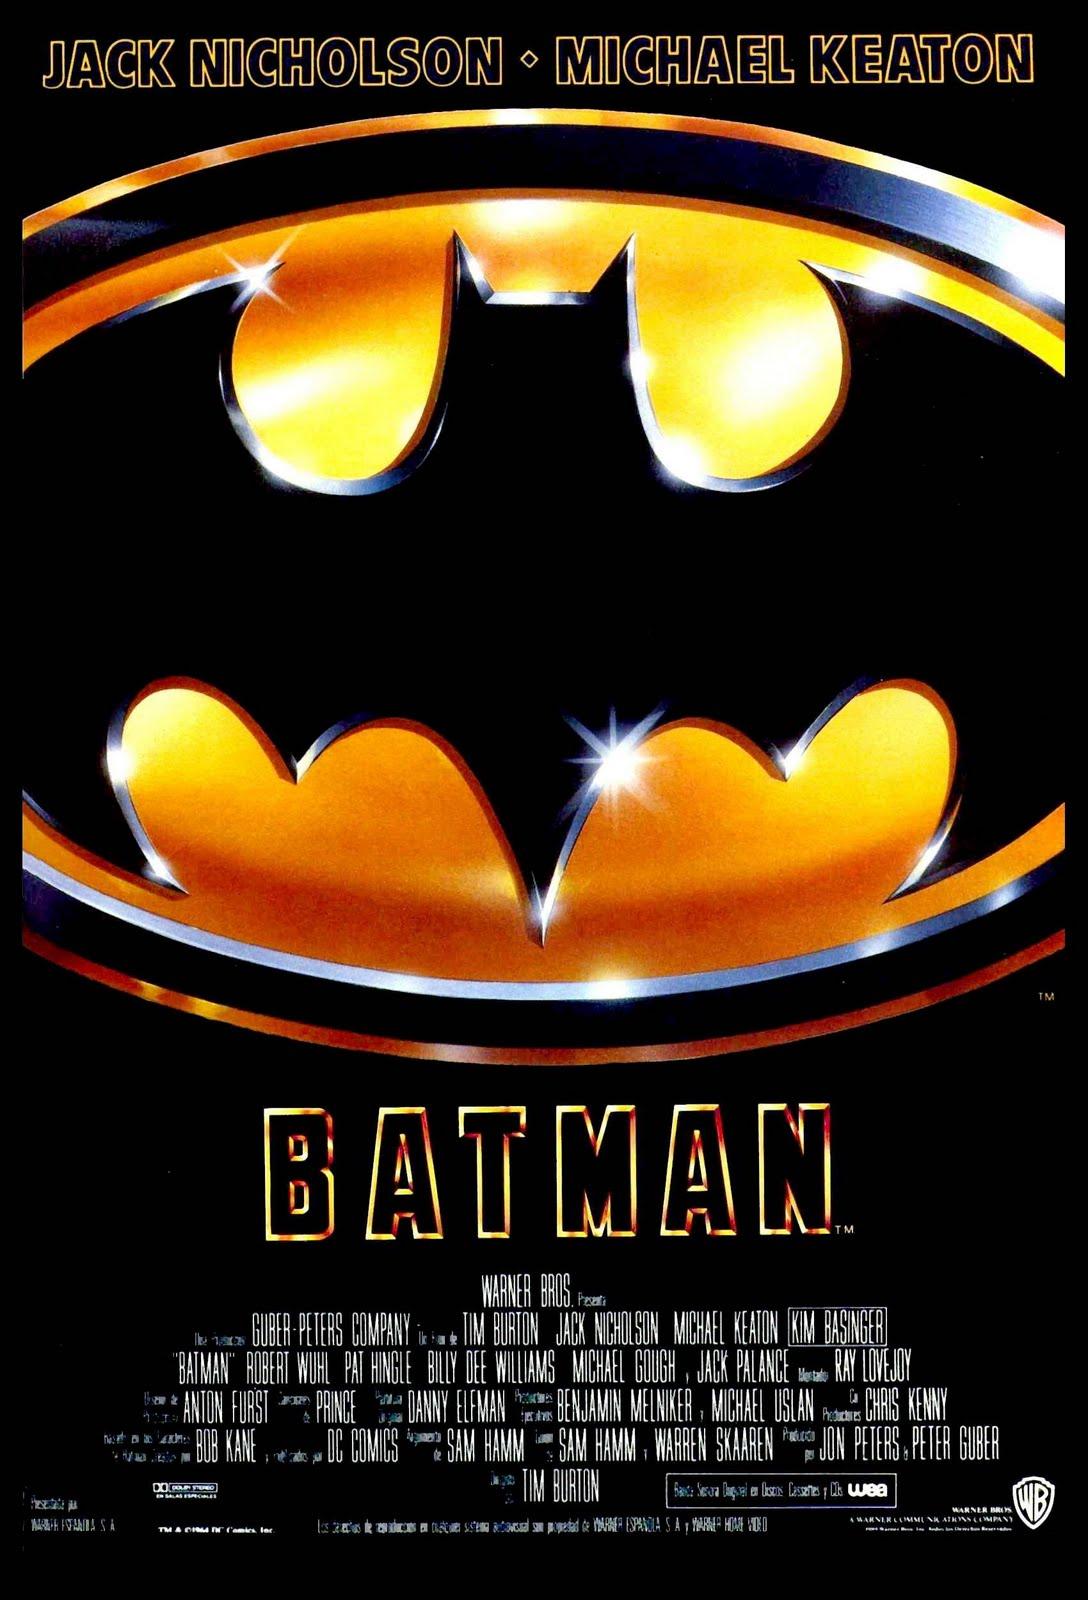 http://3.bp.blogspot.com/_5kIJyVJLRMs/TEn2B7eIKcI/AAAAAAAAD0k/YwT63HjpXz0/s1600/Batman+1-1989.jpg